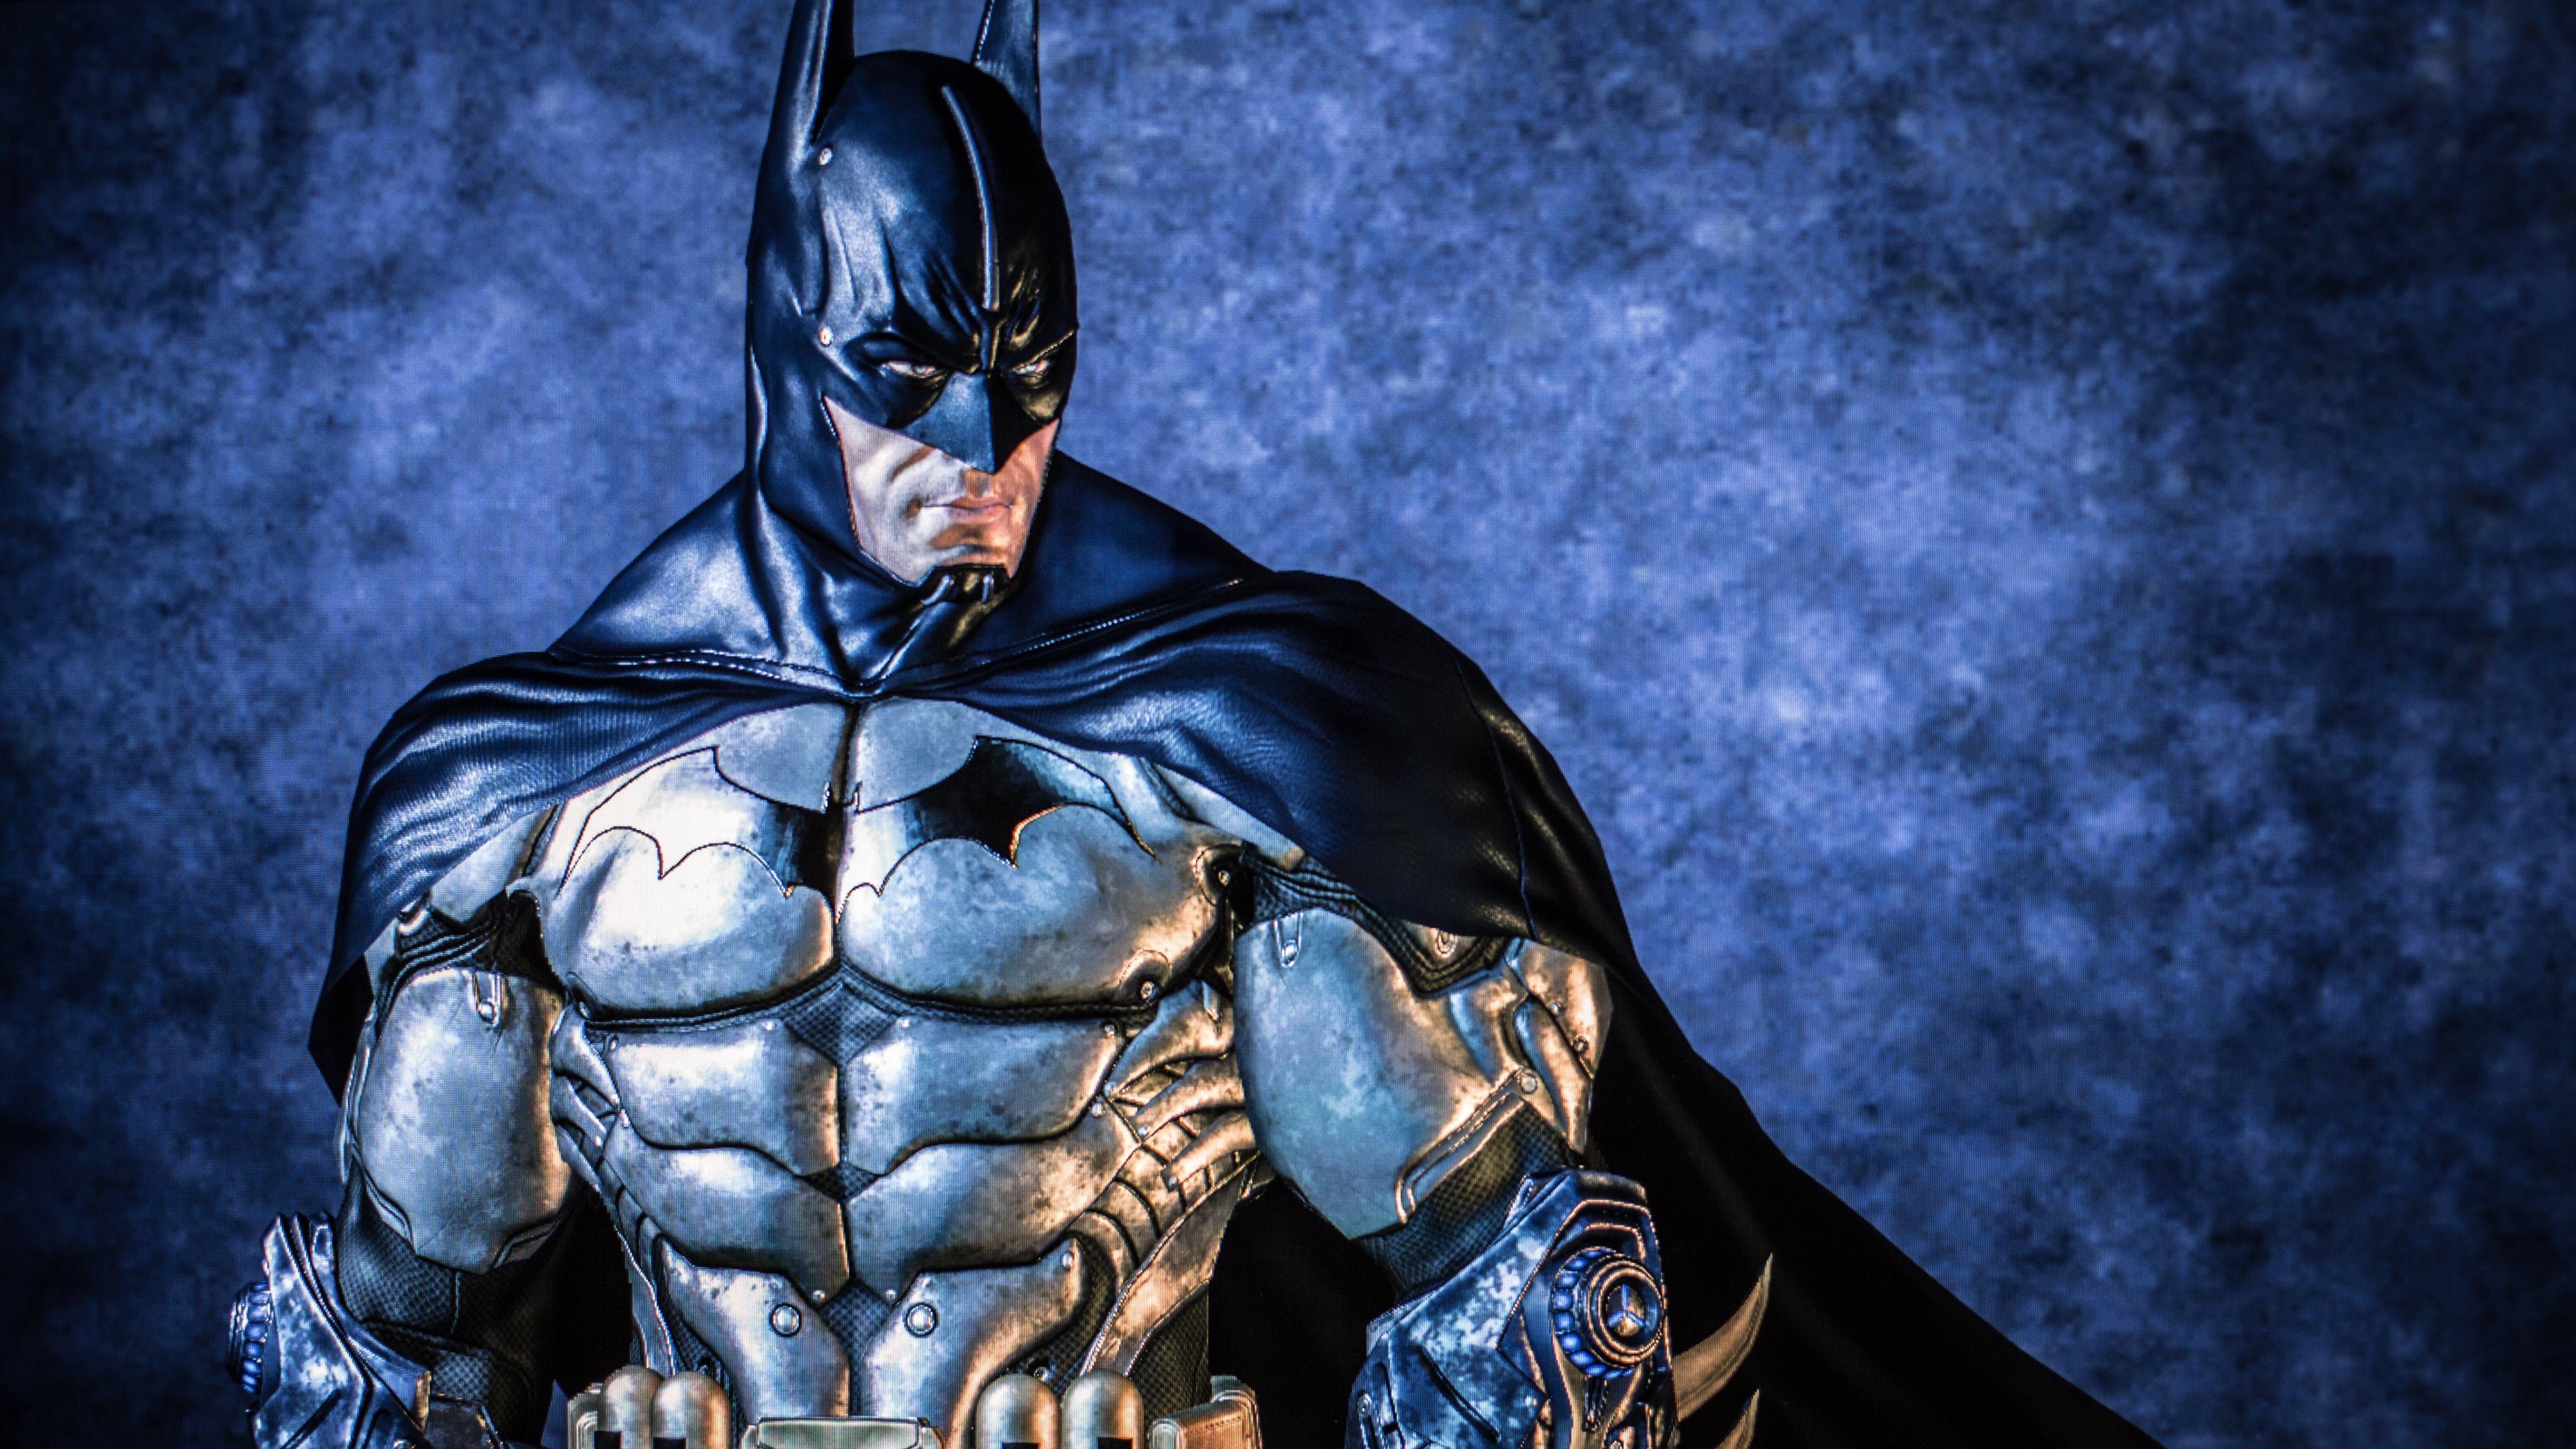 Batman 4k Ultra HD Papel De Parede And Planos De Fundo